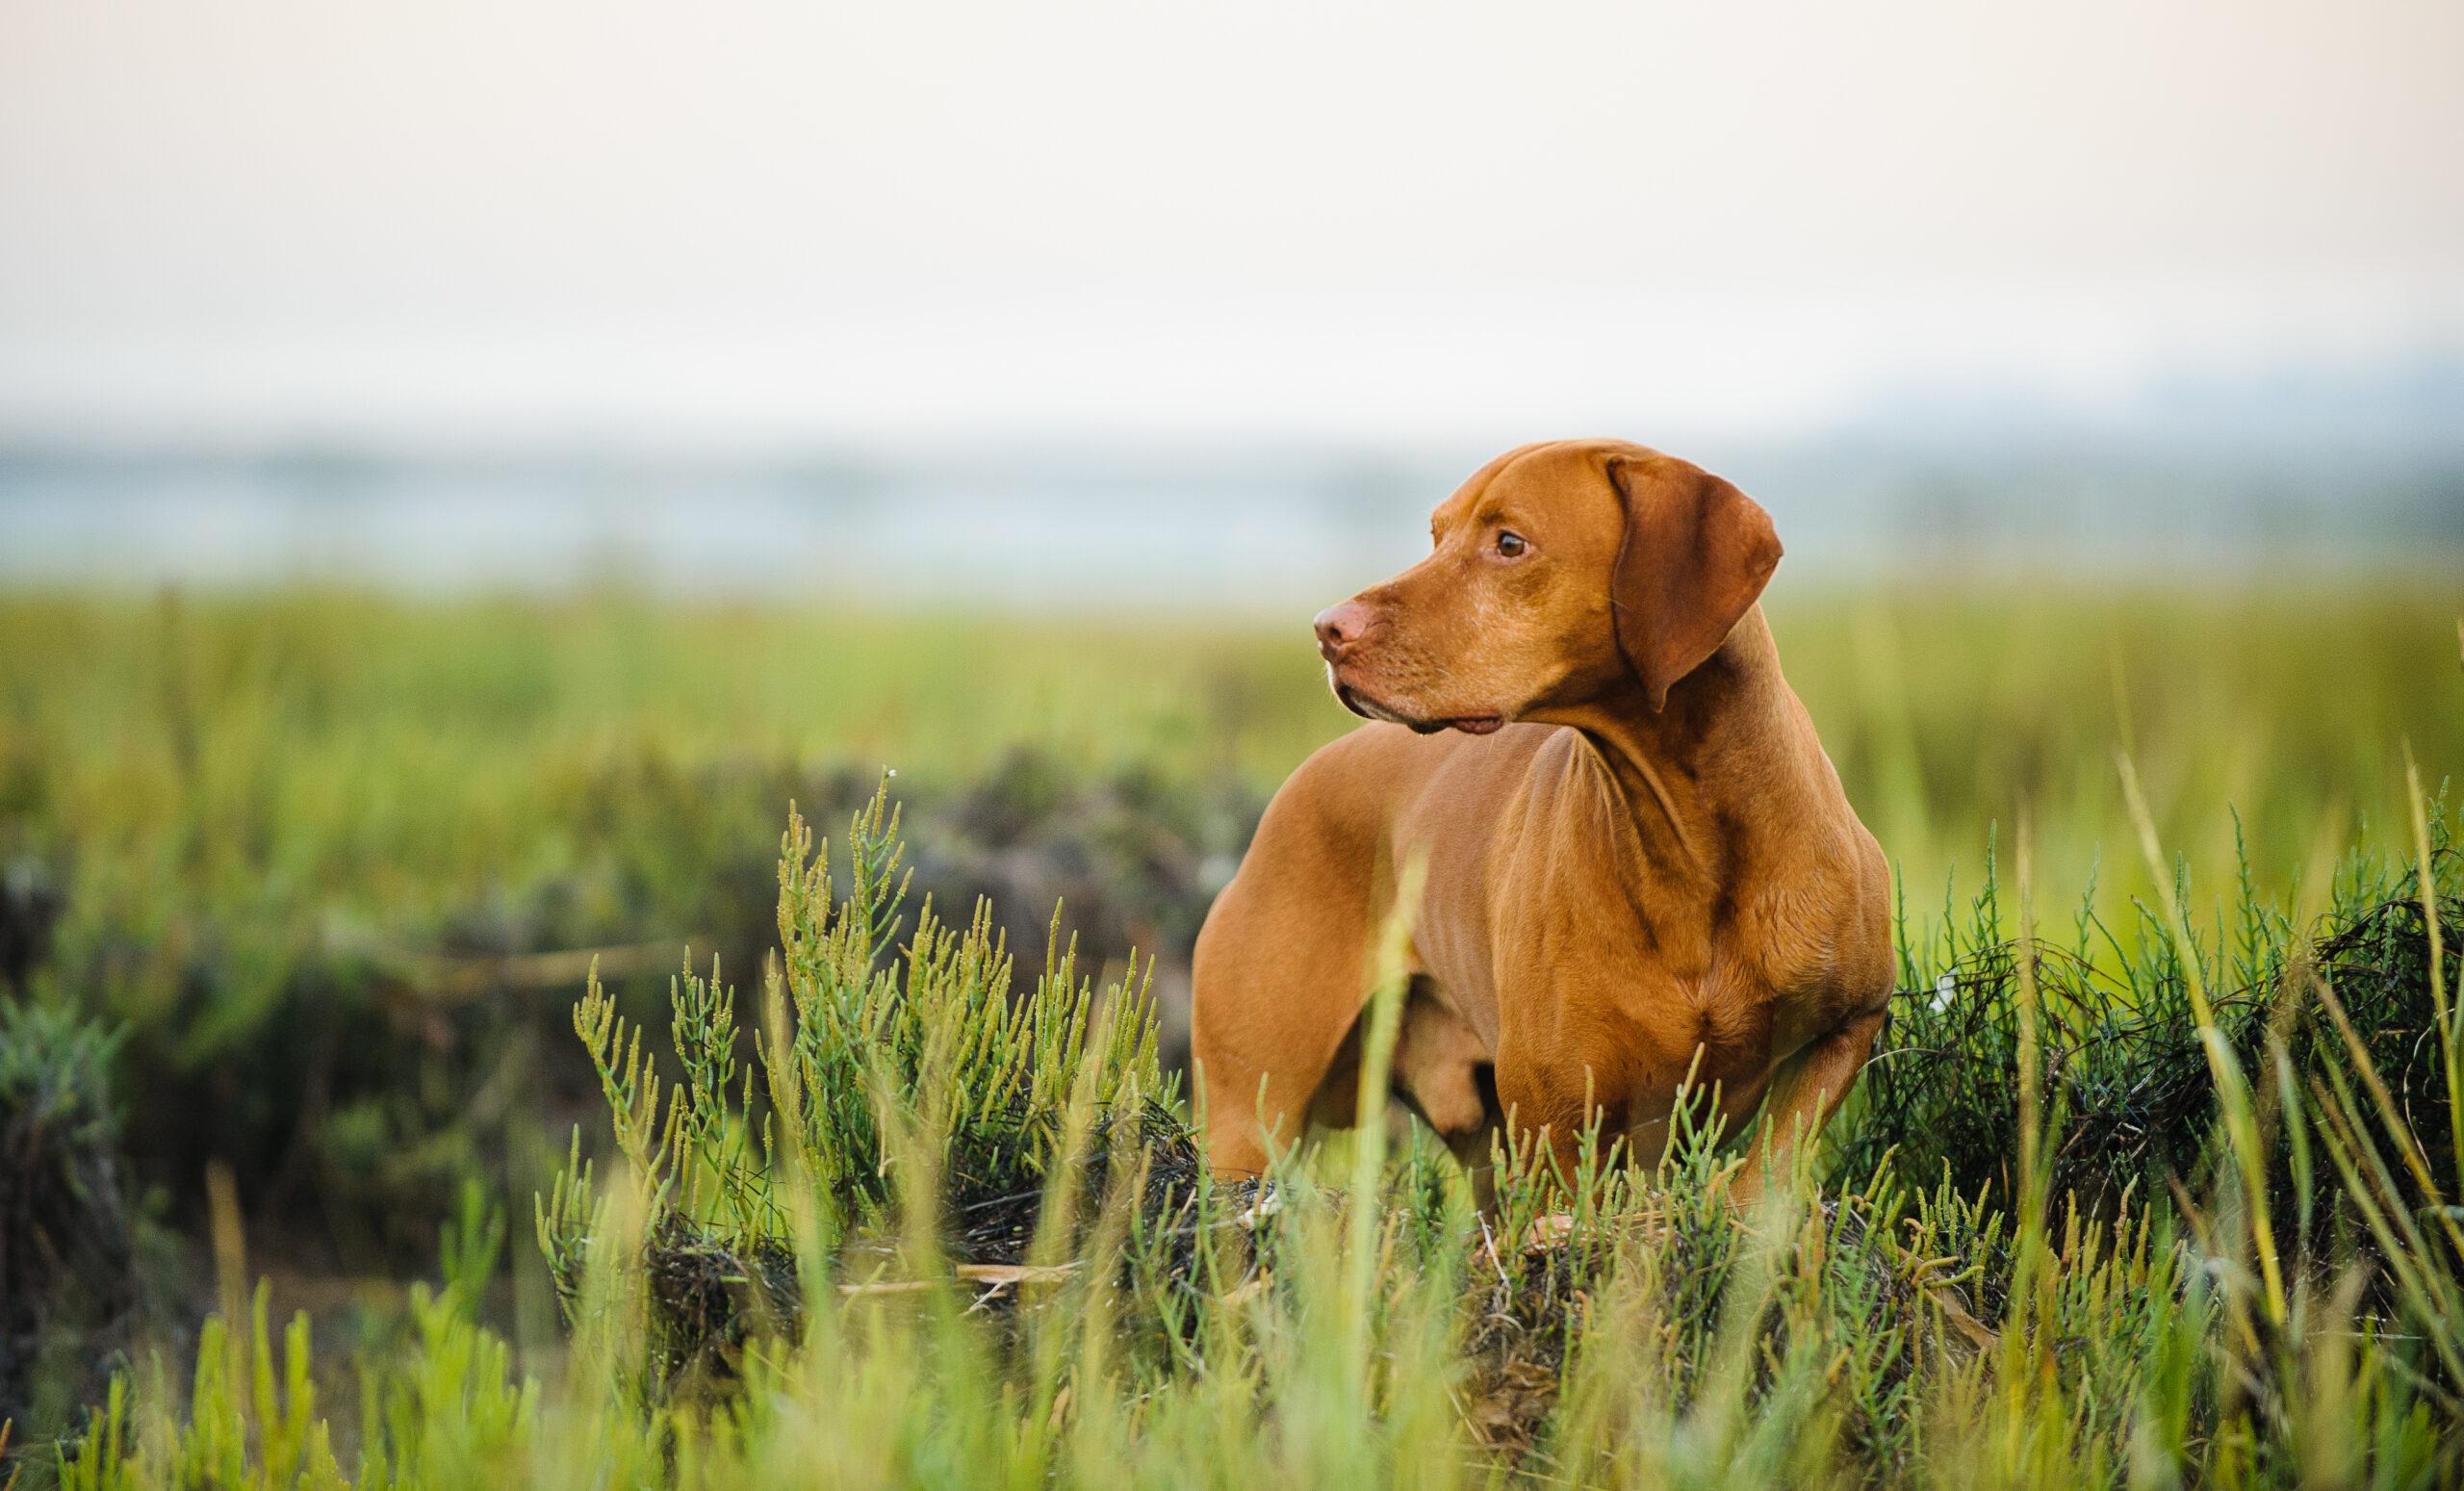 Vizsla dog standing in the tall grass of a field